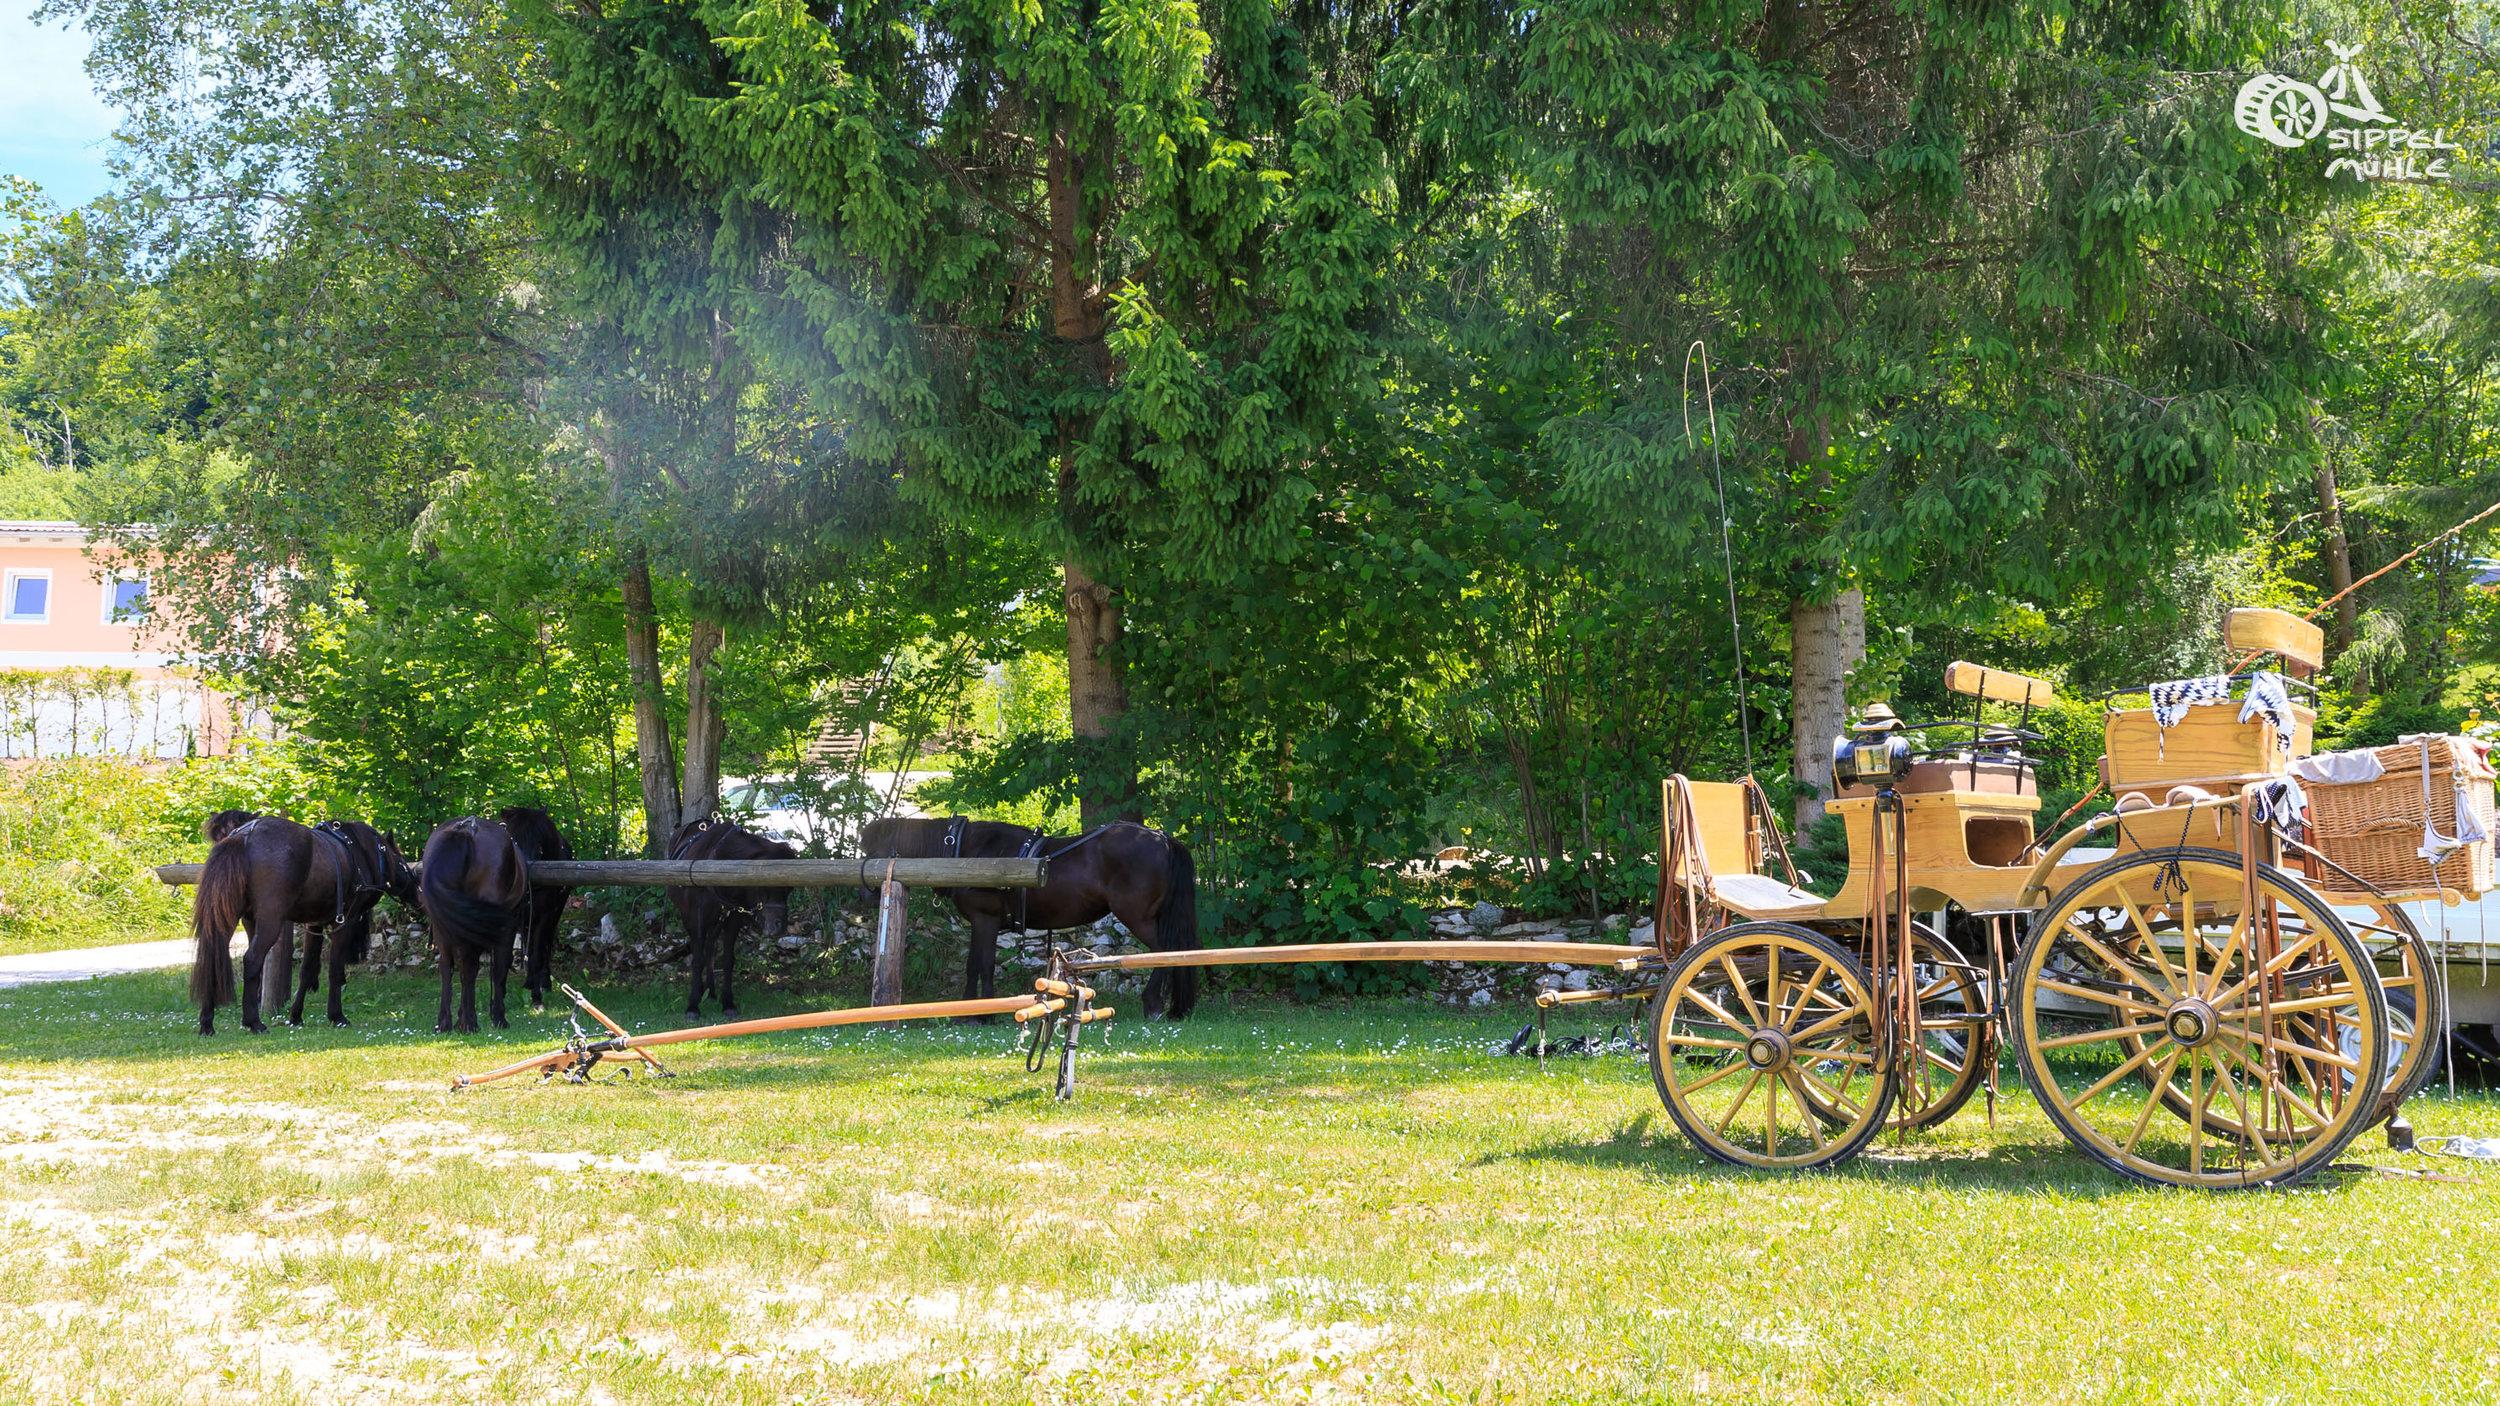 20170611-Campingplatz-0035.jpg